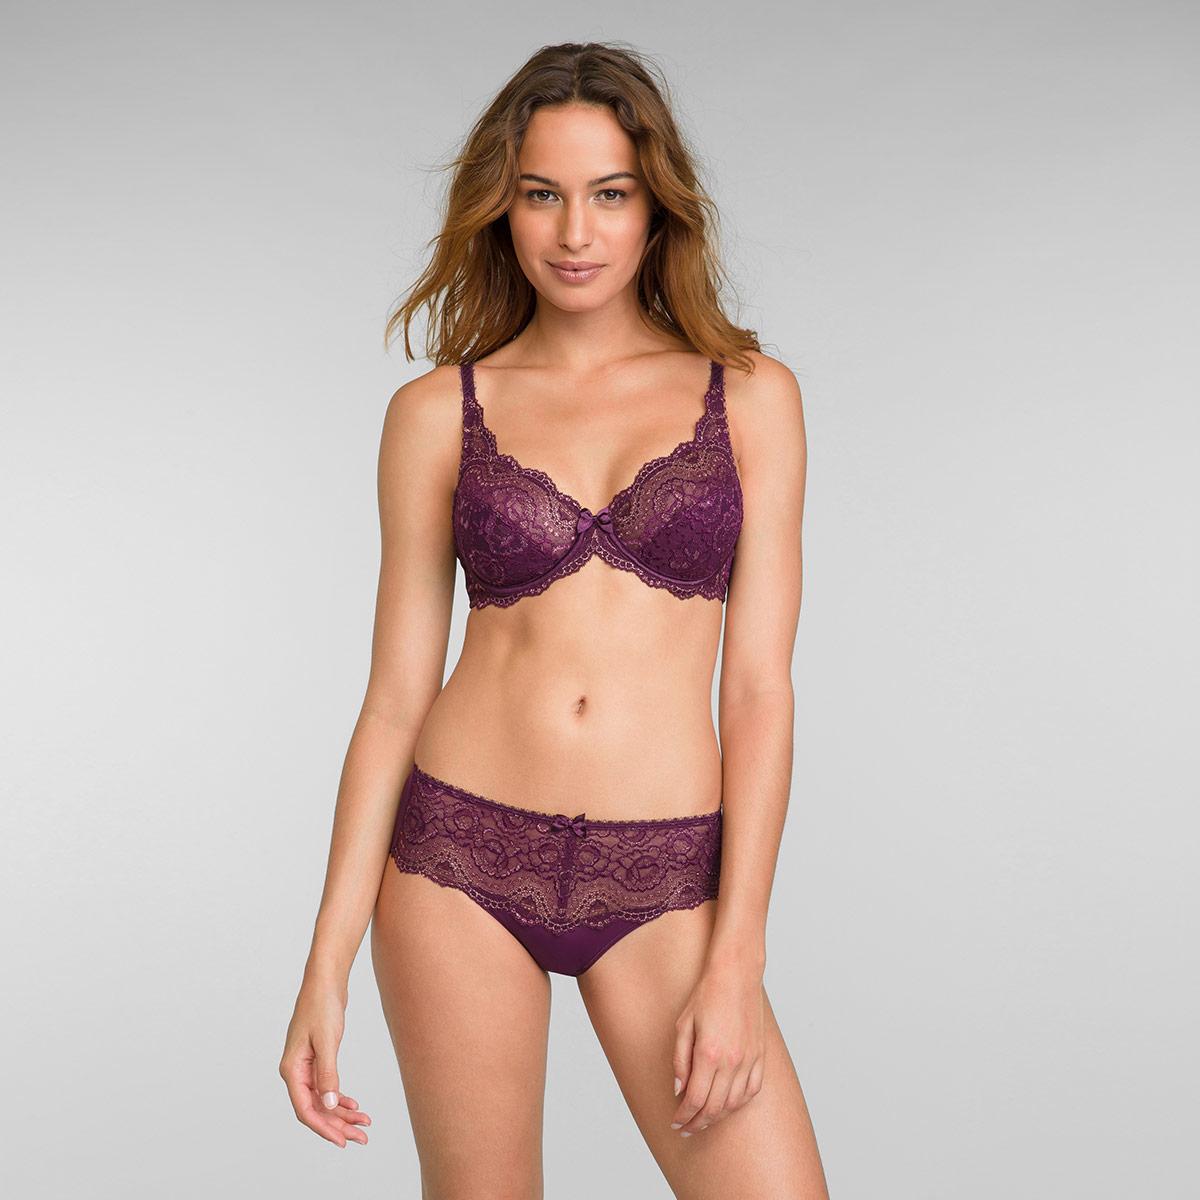 Culotte dentelle violette et doré Flower Elegance, , PLAYTEX